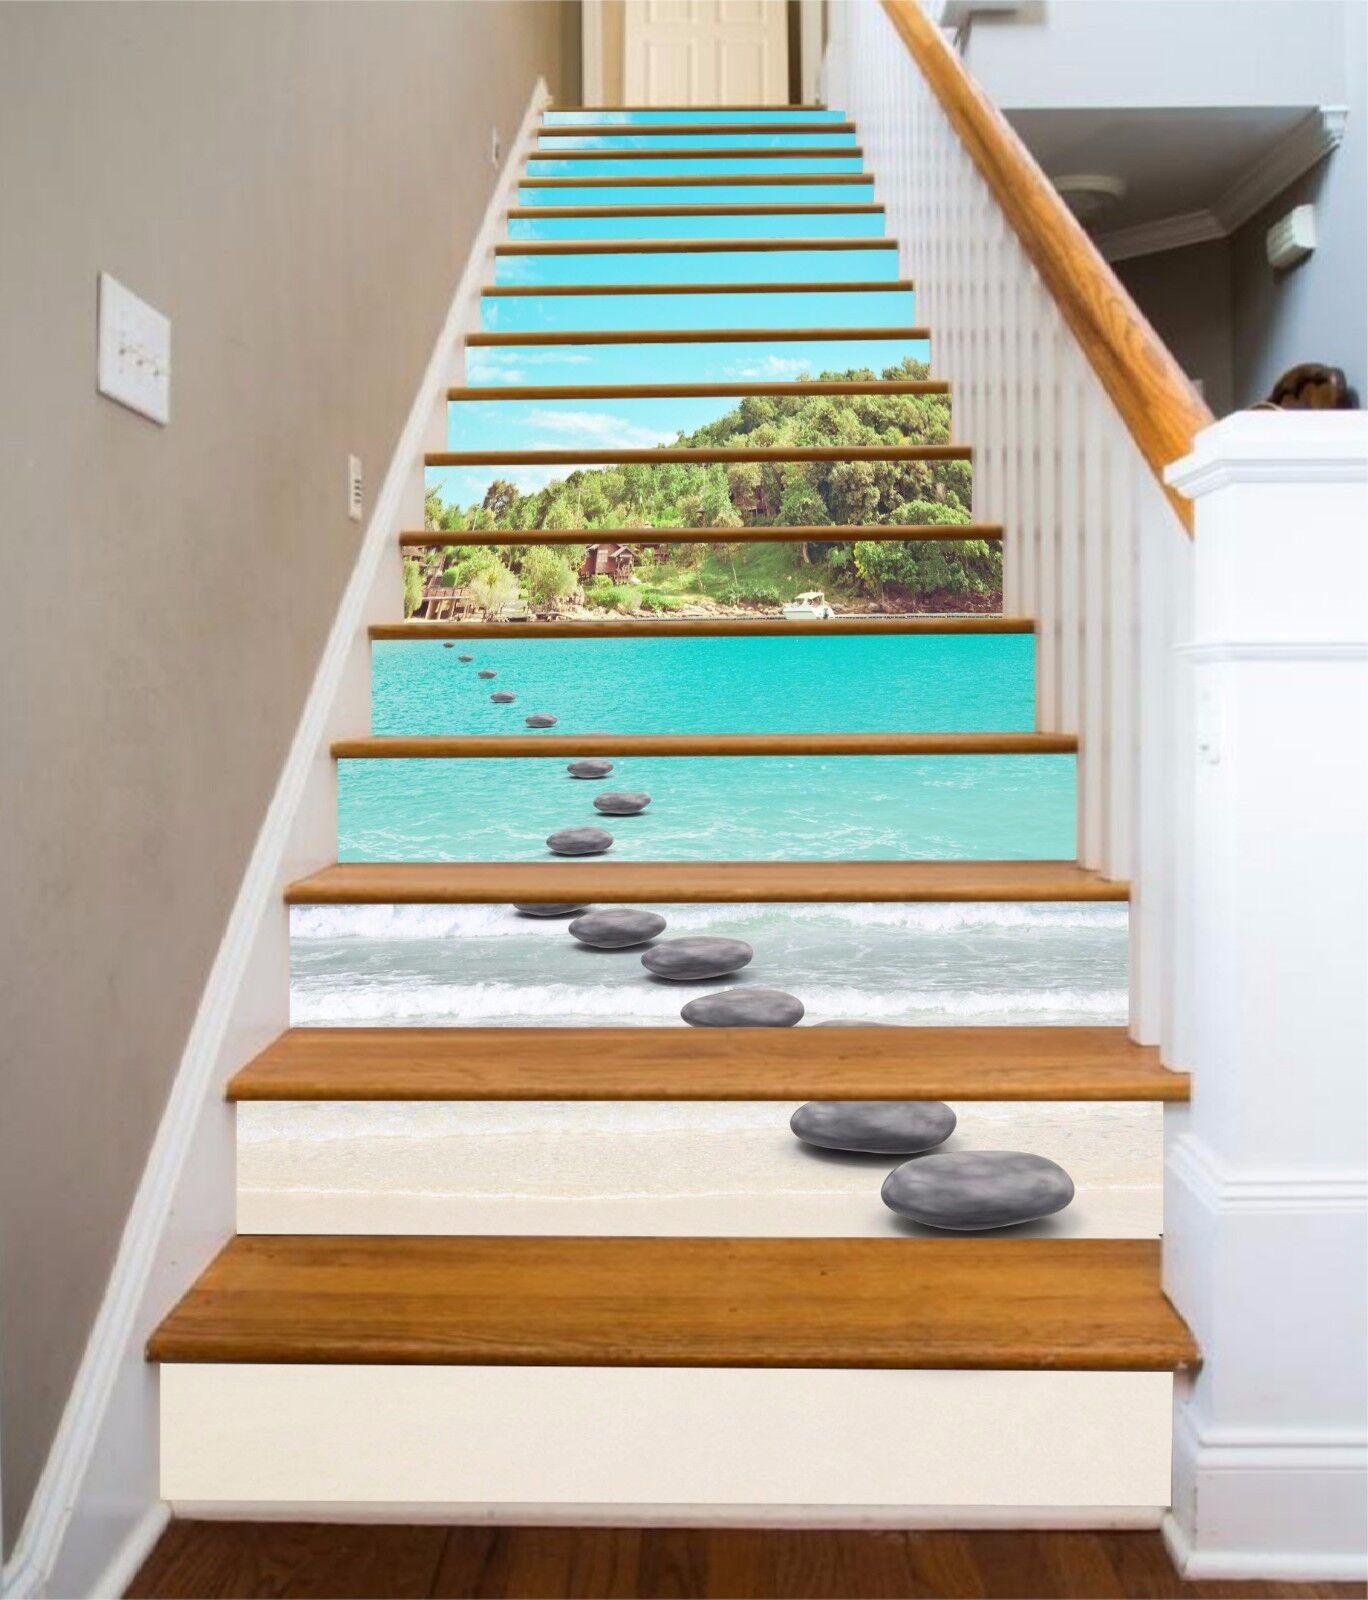 3D Bay Stones Road Stair Risers Decoration Photo Mural Vinyl Decal Wallpaper AU